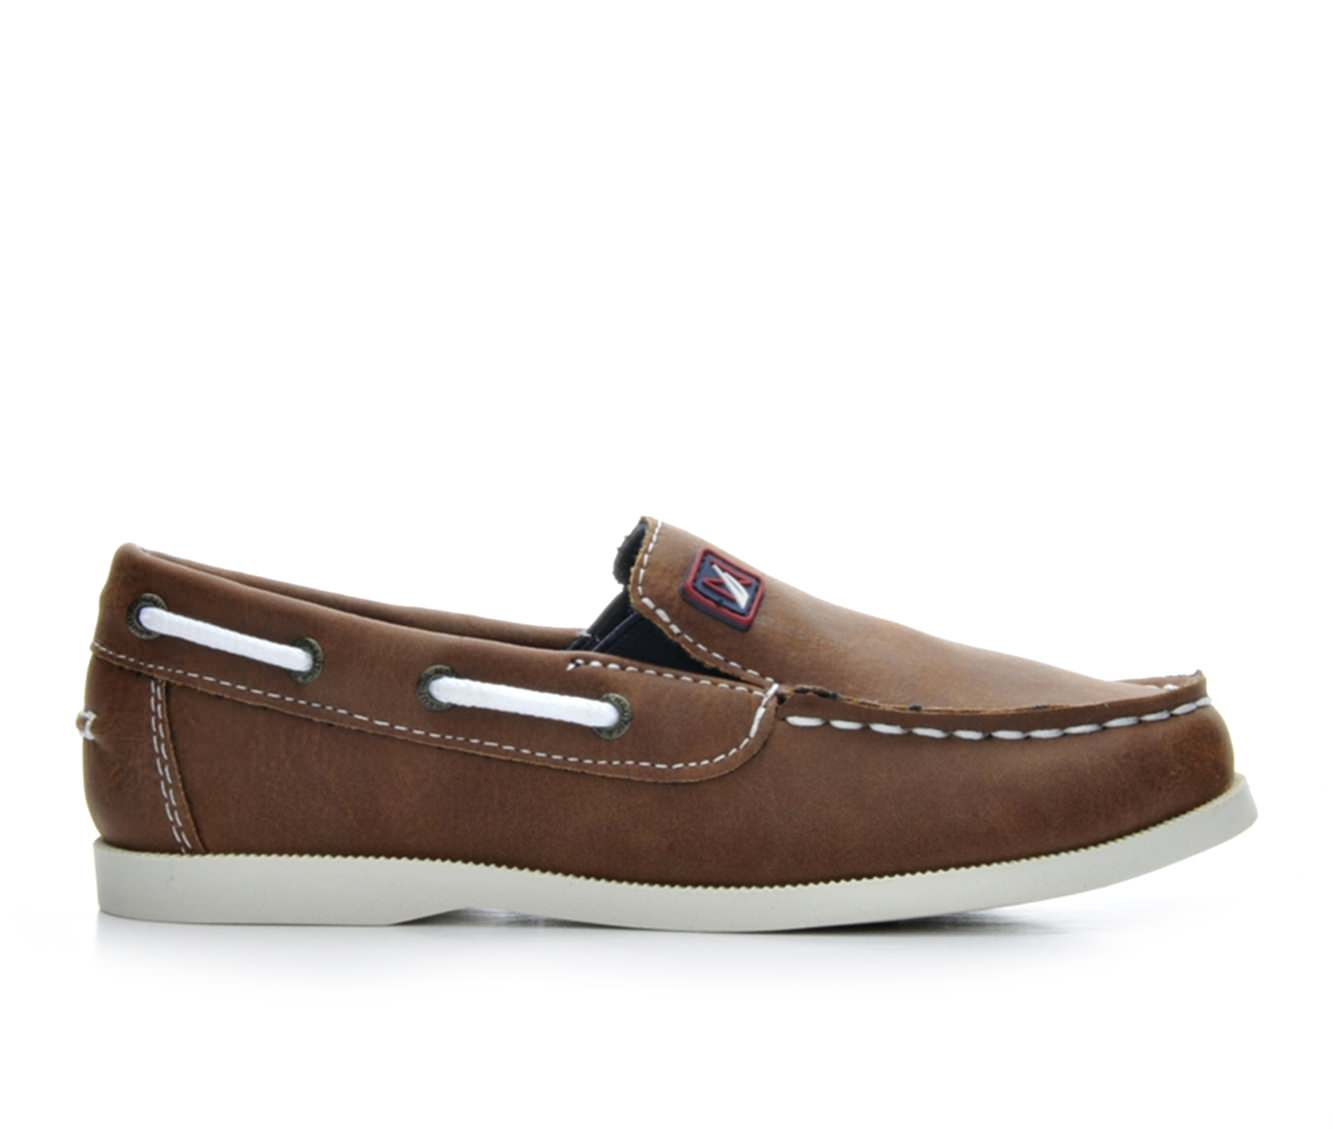 Boys' Nautica Rowlock Boat Shoes (Brown)